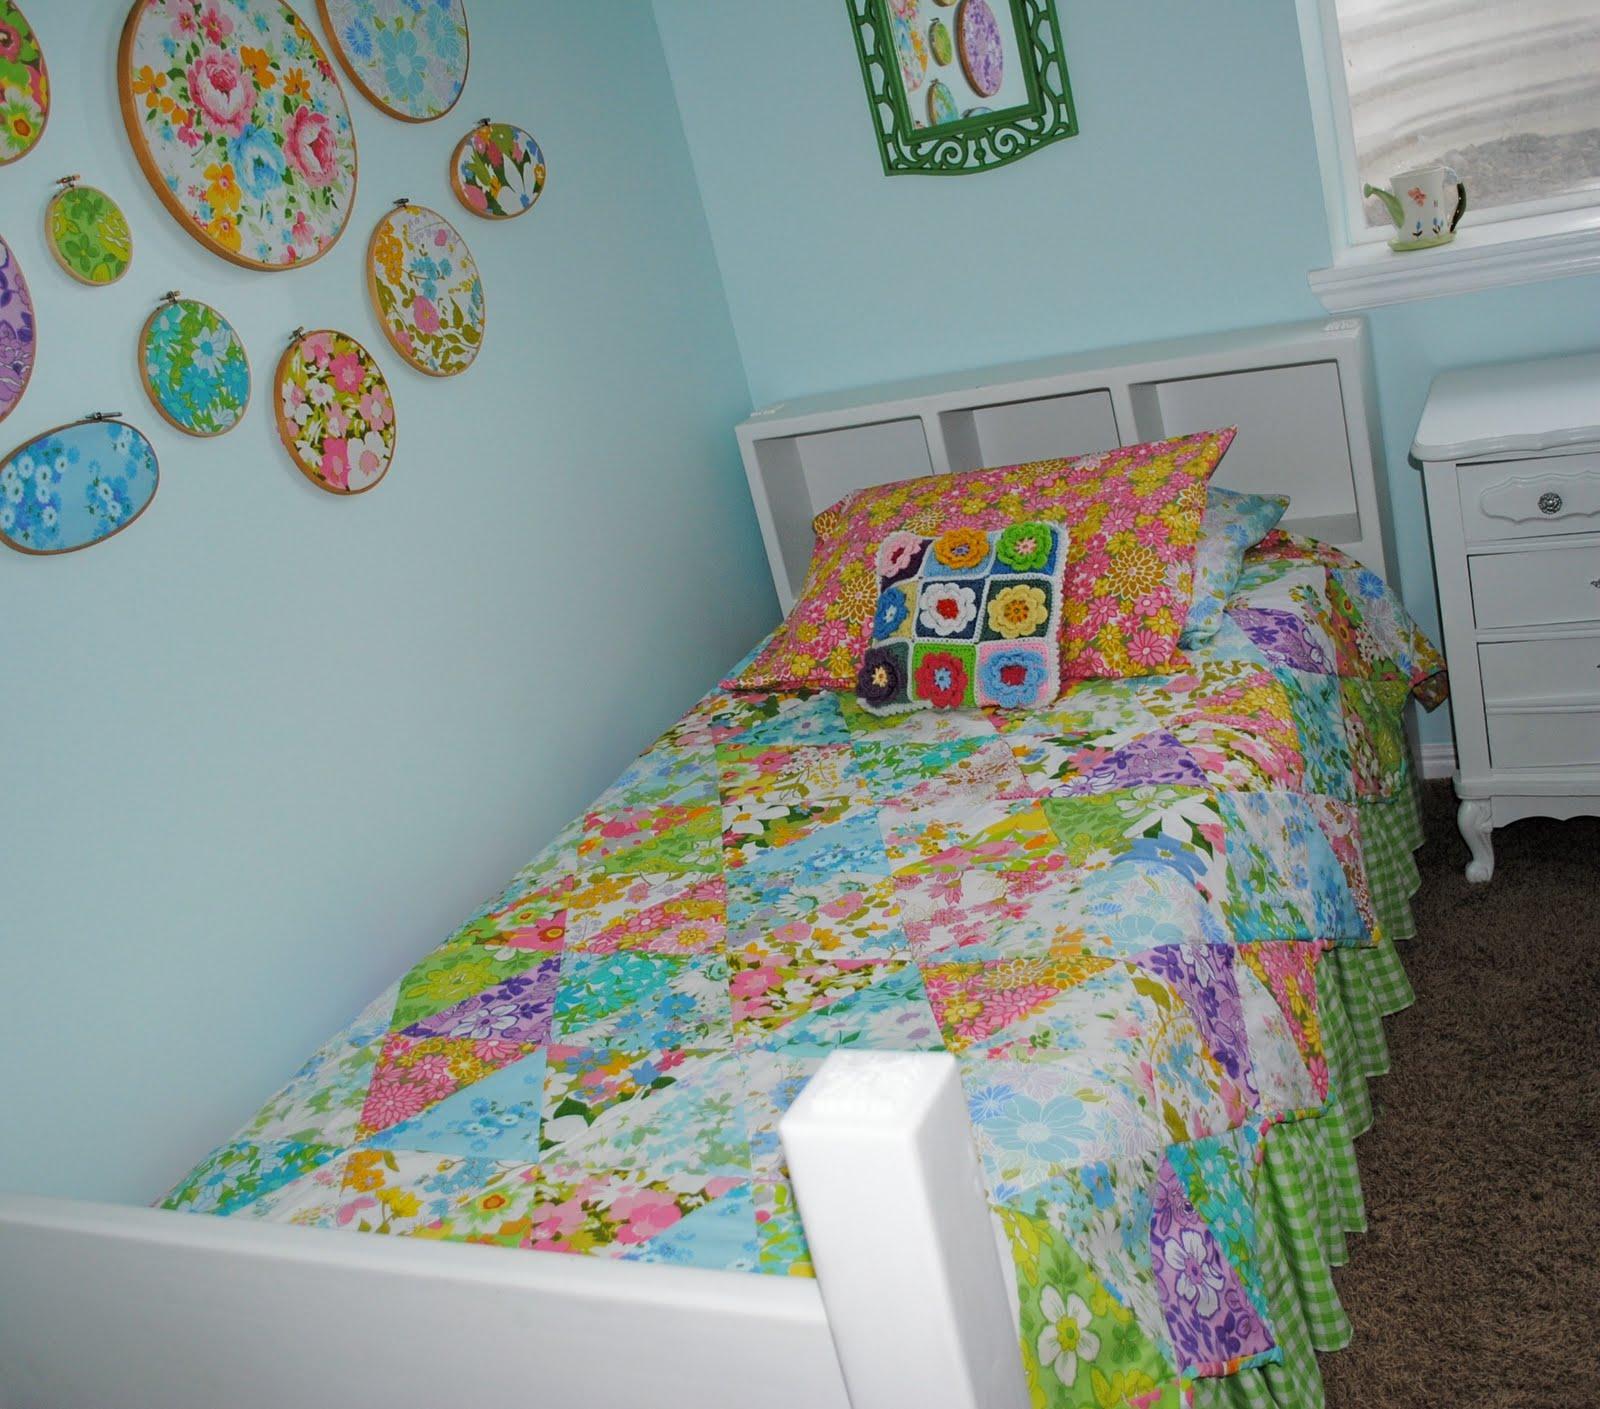 Hideaway Girl Vintage Inspired Bedroom Make Over